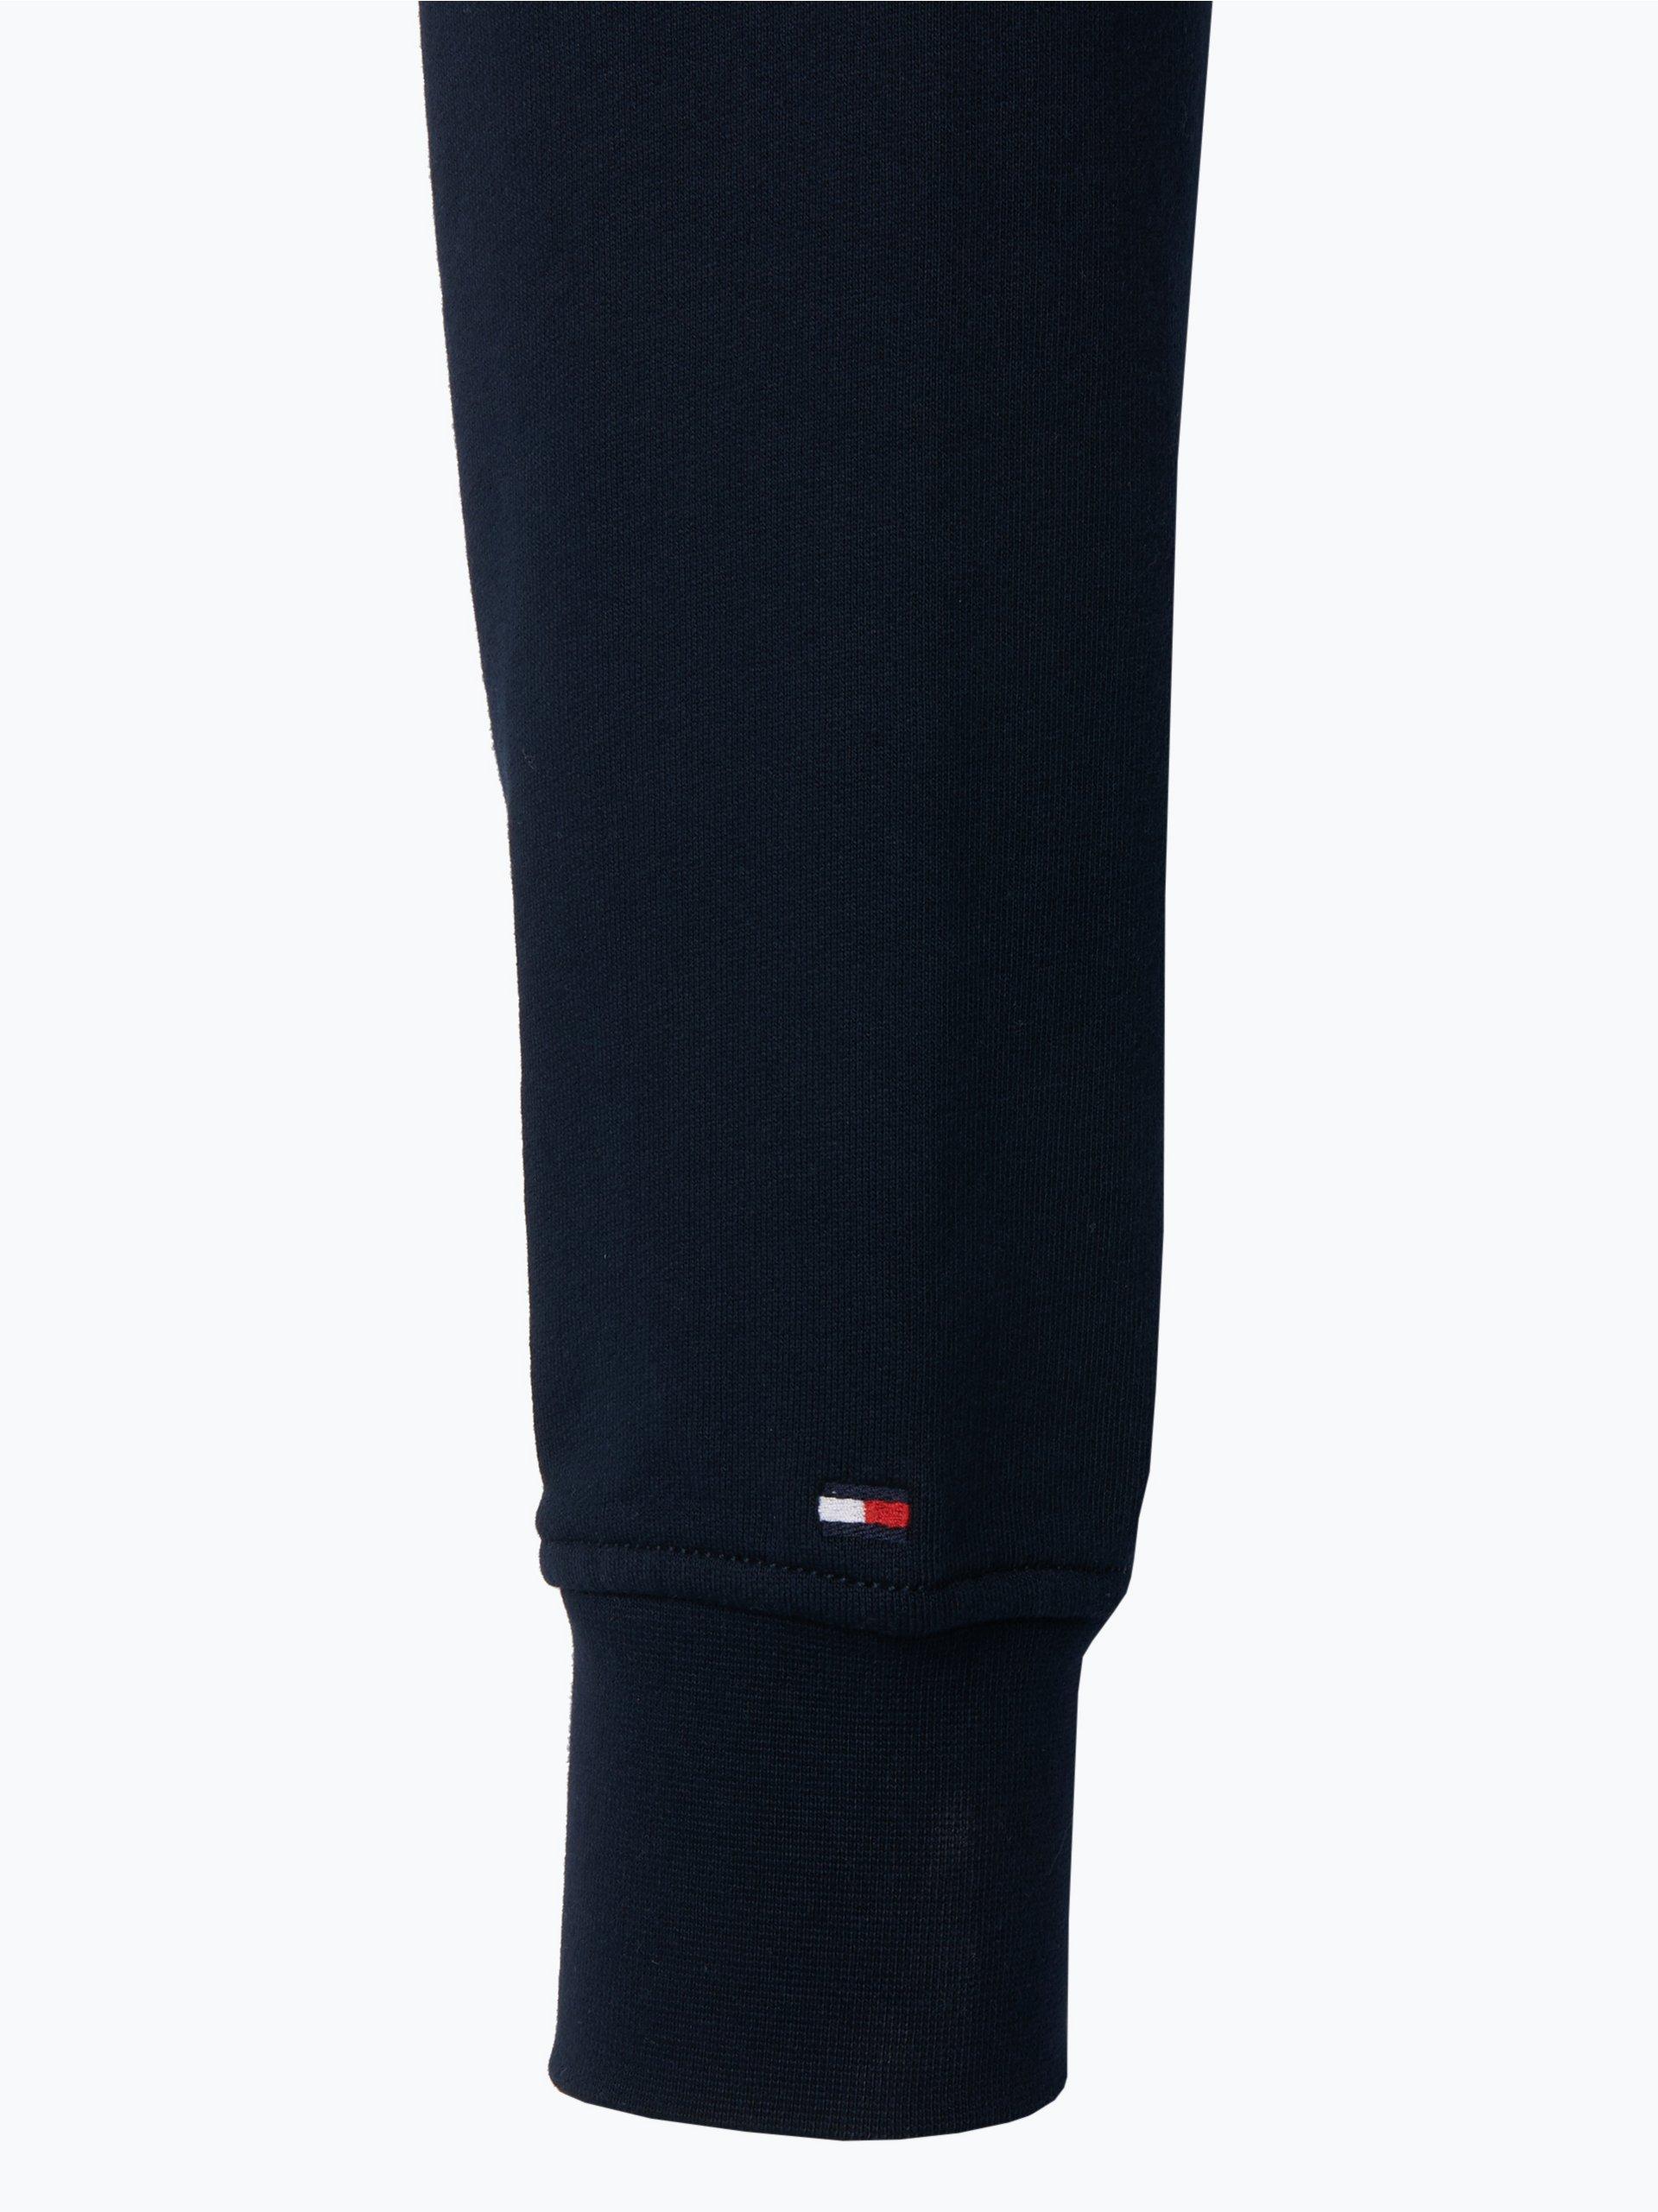 Tommy Hilfiger Herren Sweatshirt - Darrel